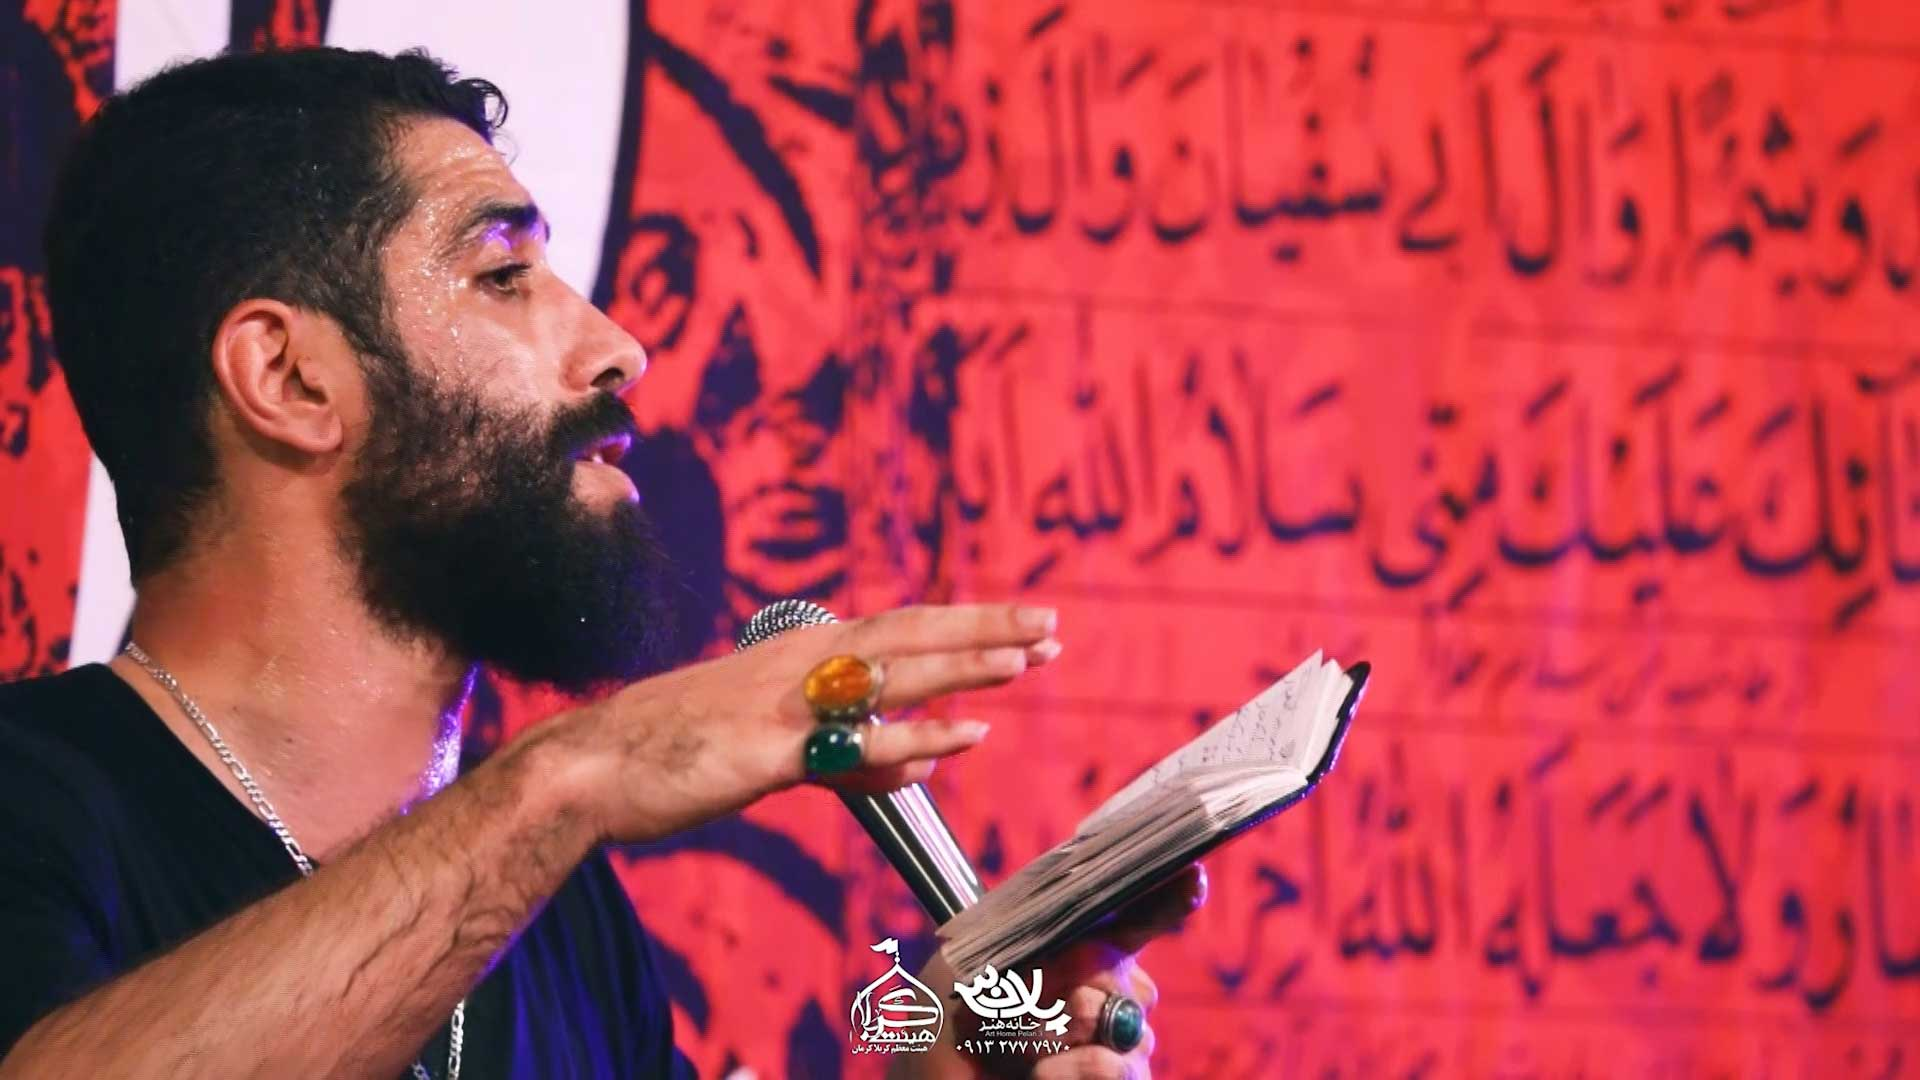 کاشف الکلب تویی مجید رضانژاد